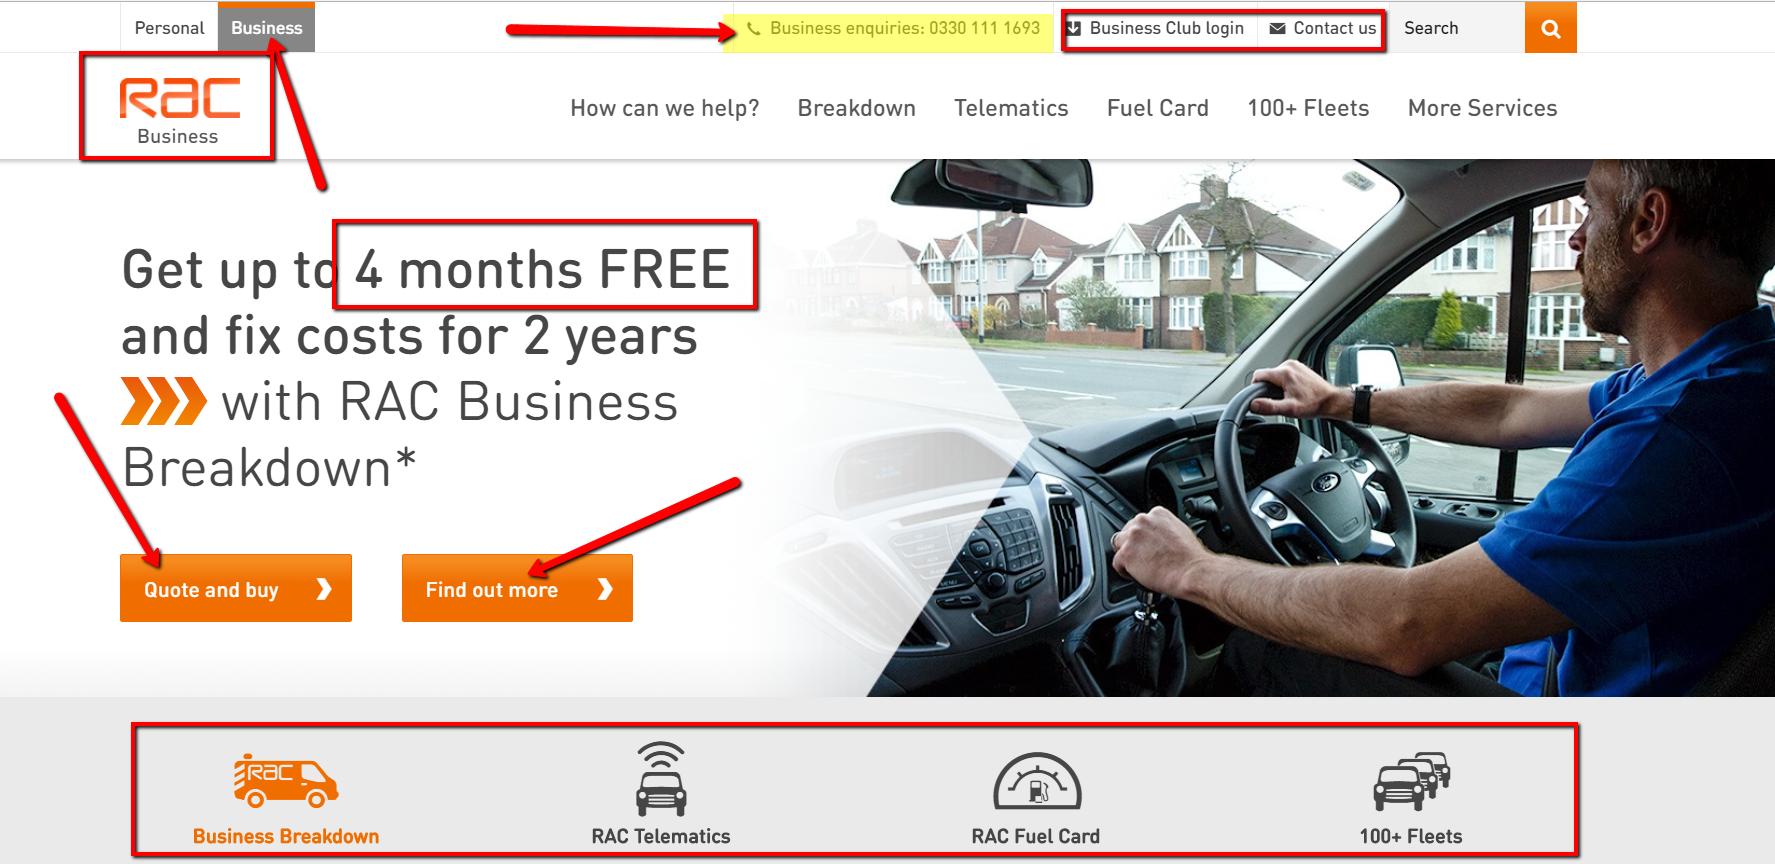 RAC Business Customer Driving